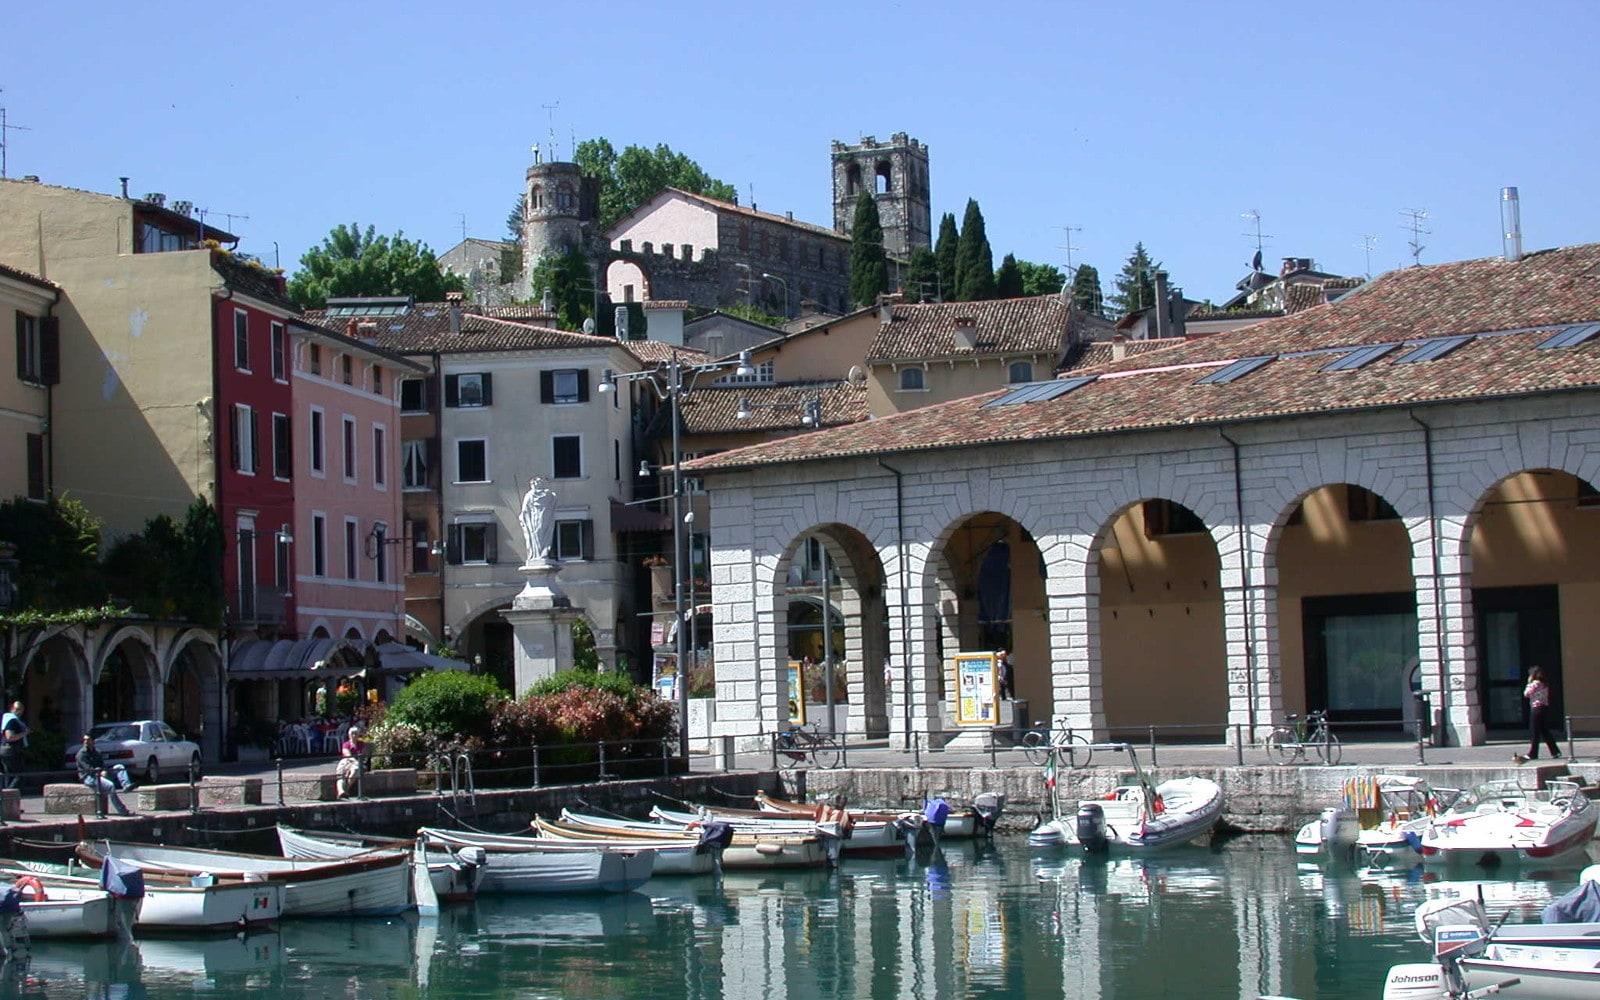 GUIDED TOUR OF DESENZANO AND ITS ROMAN VILLA